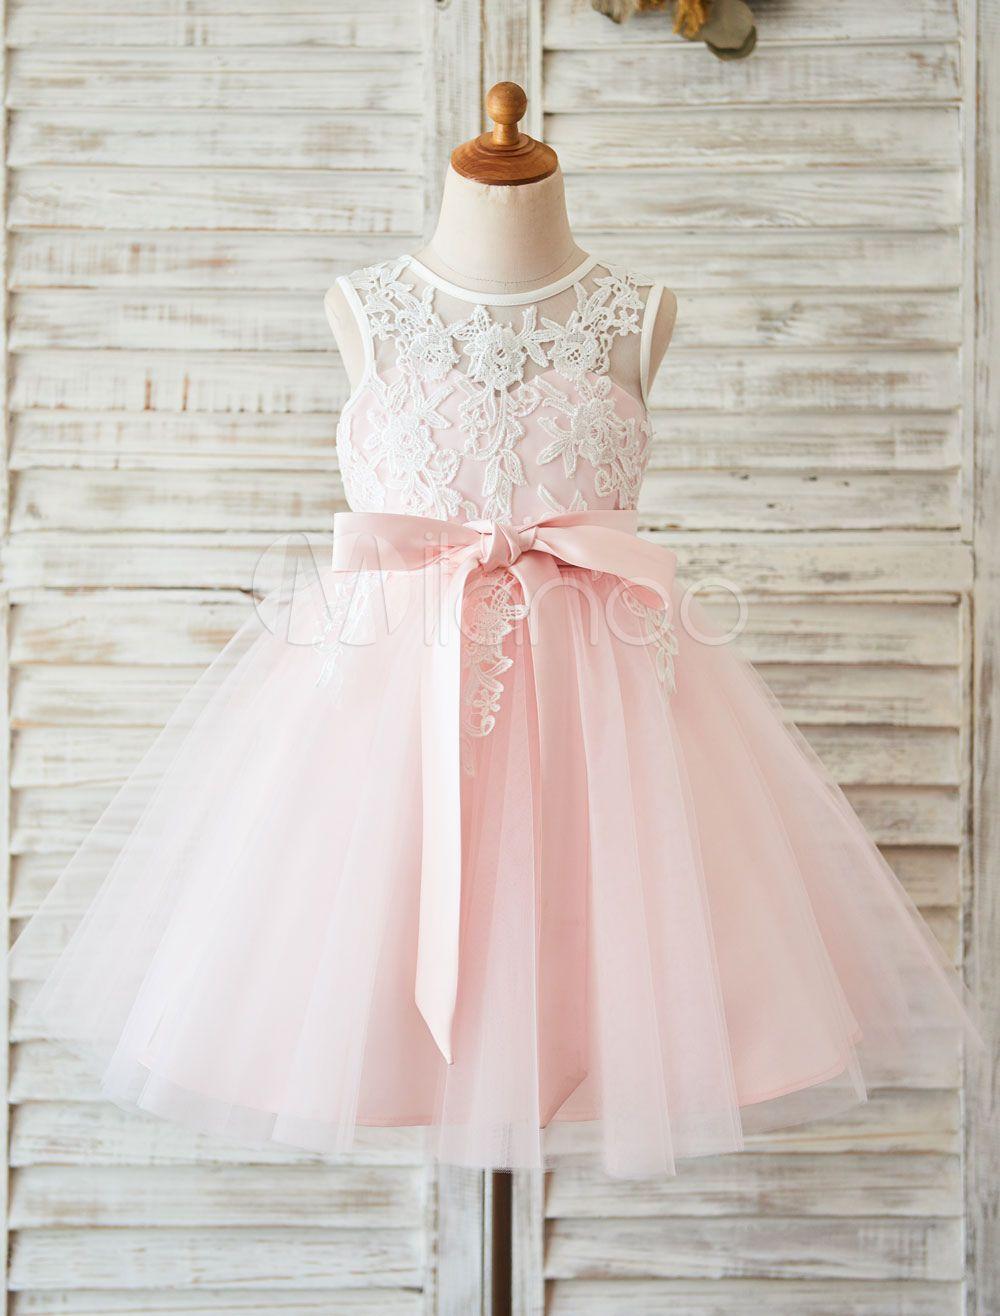 Tutu Flower Girl Dress Ivory Lace Princess Toddler\'s Pageant Dress ...